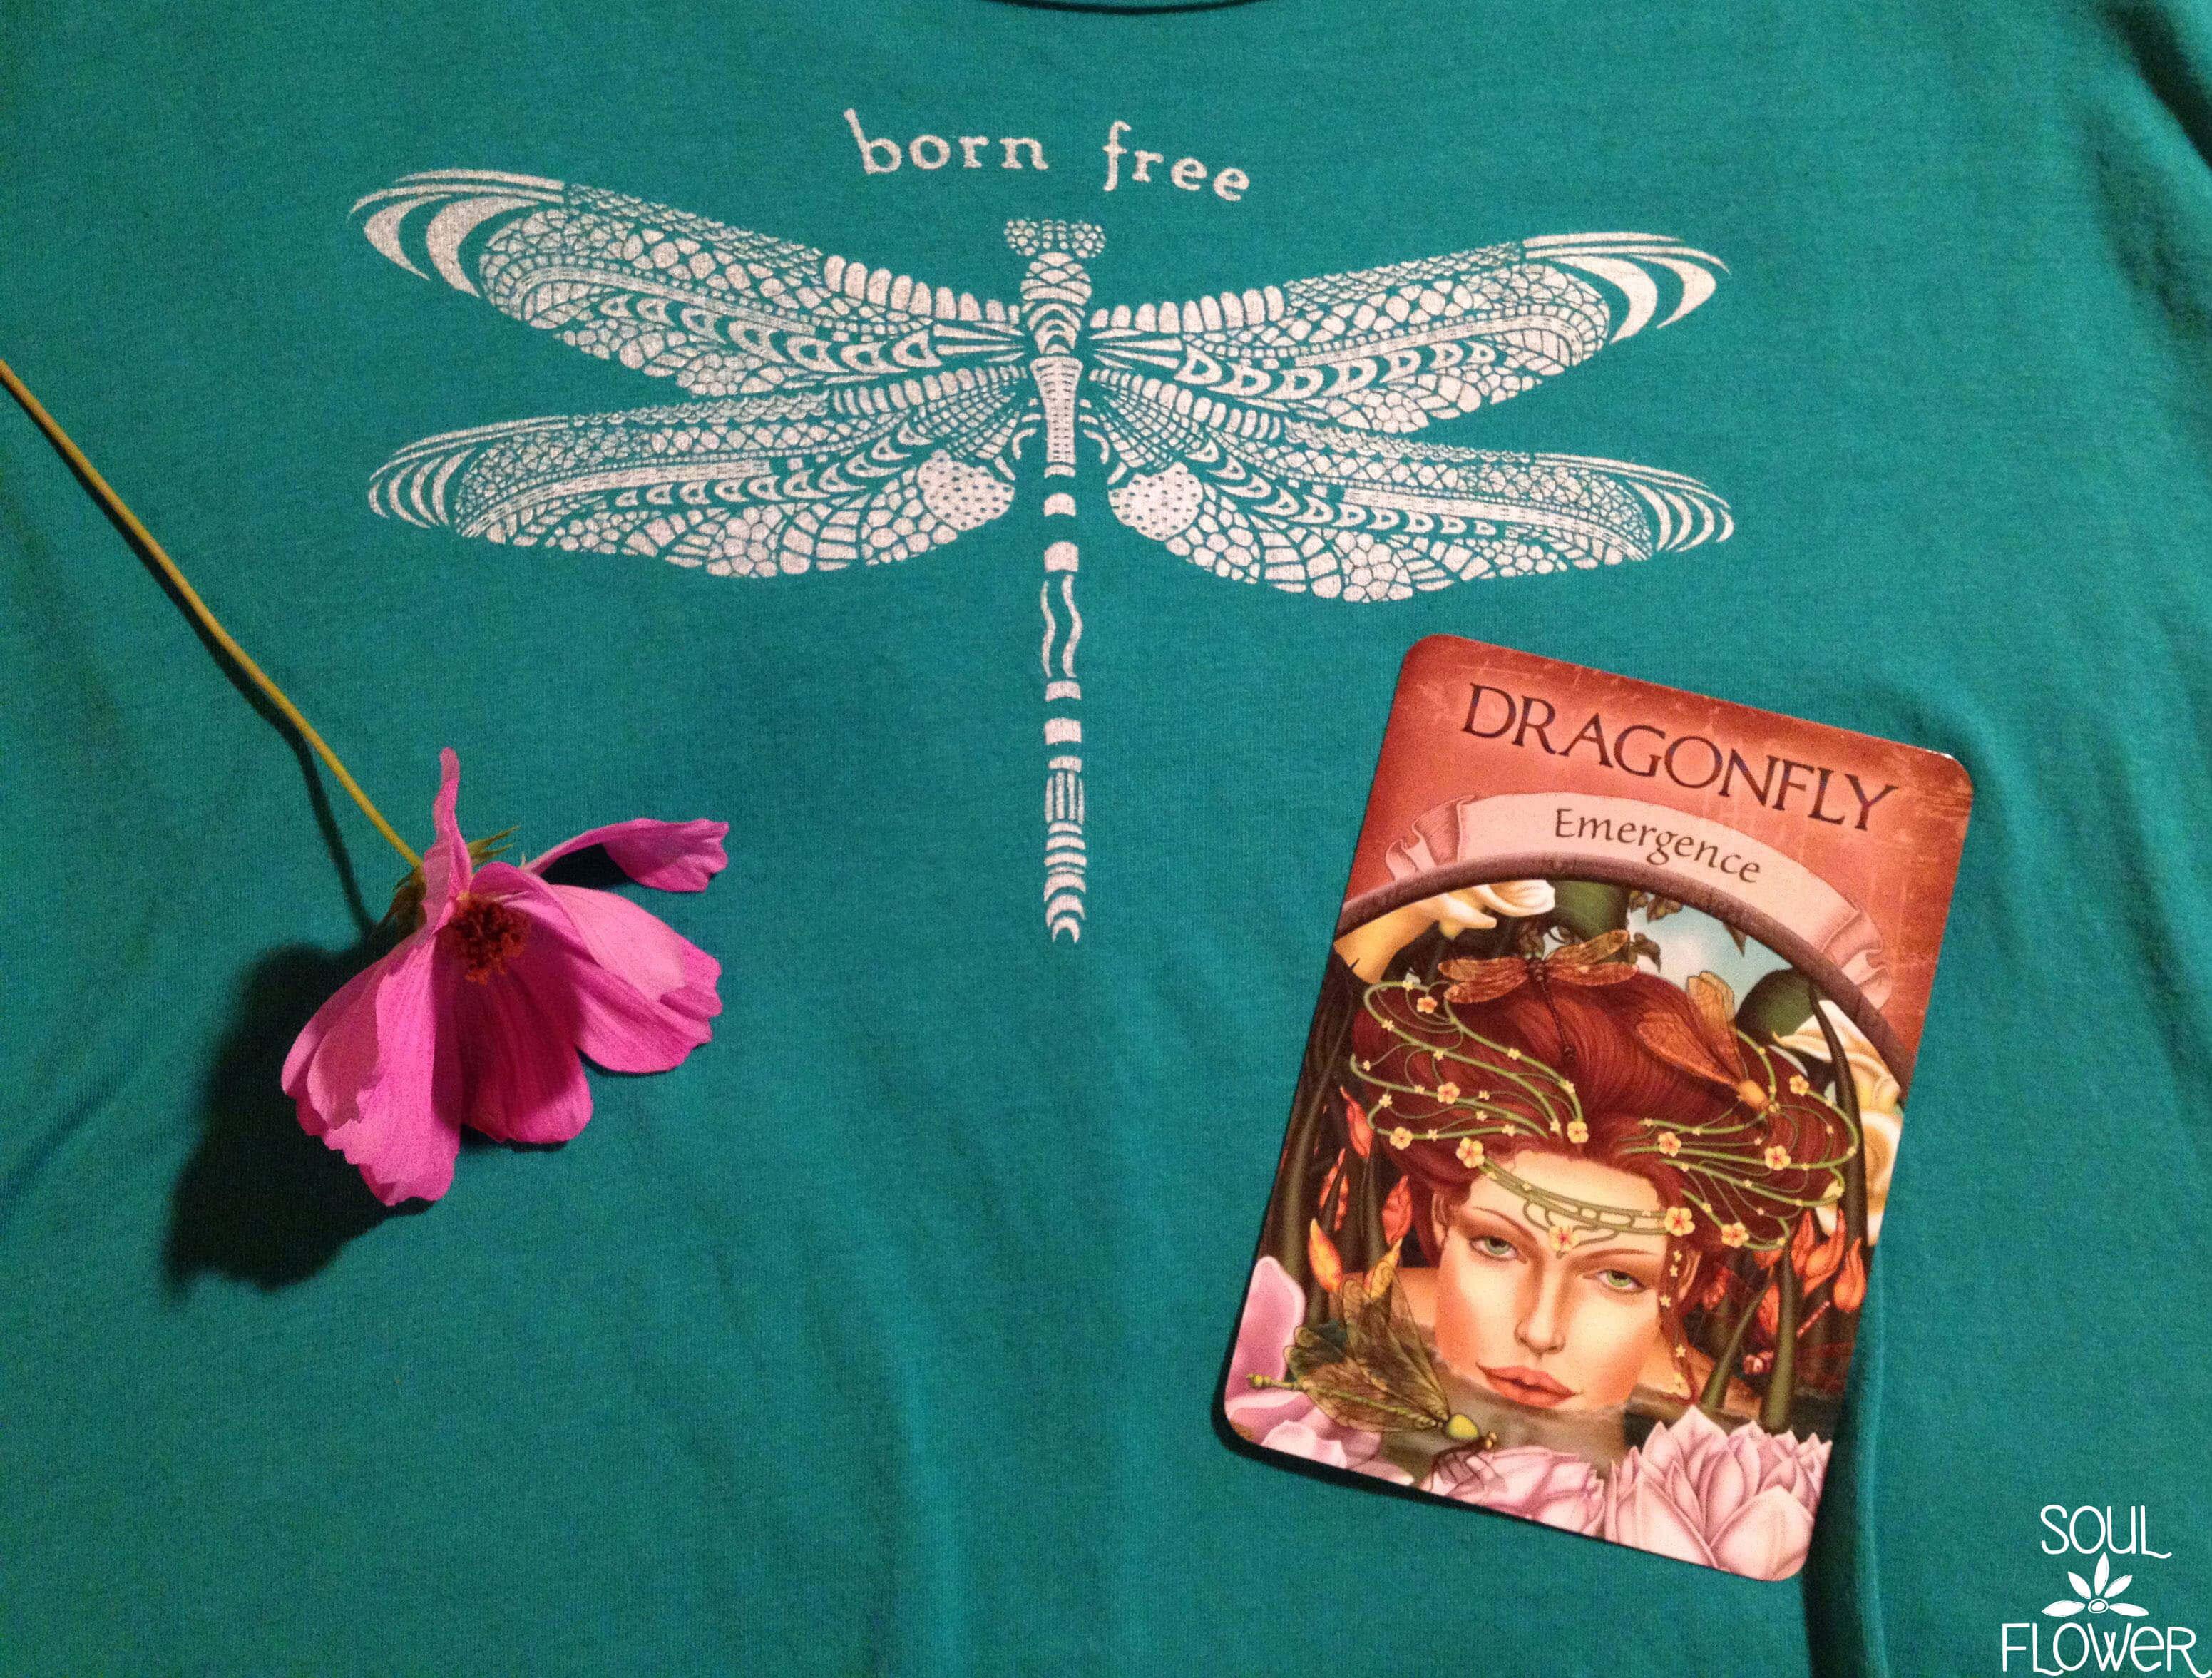 dragonfly medicine 3